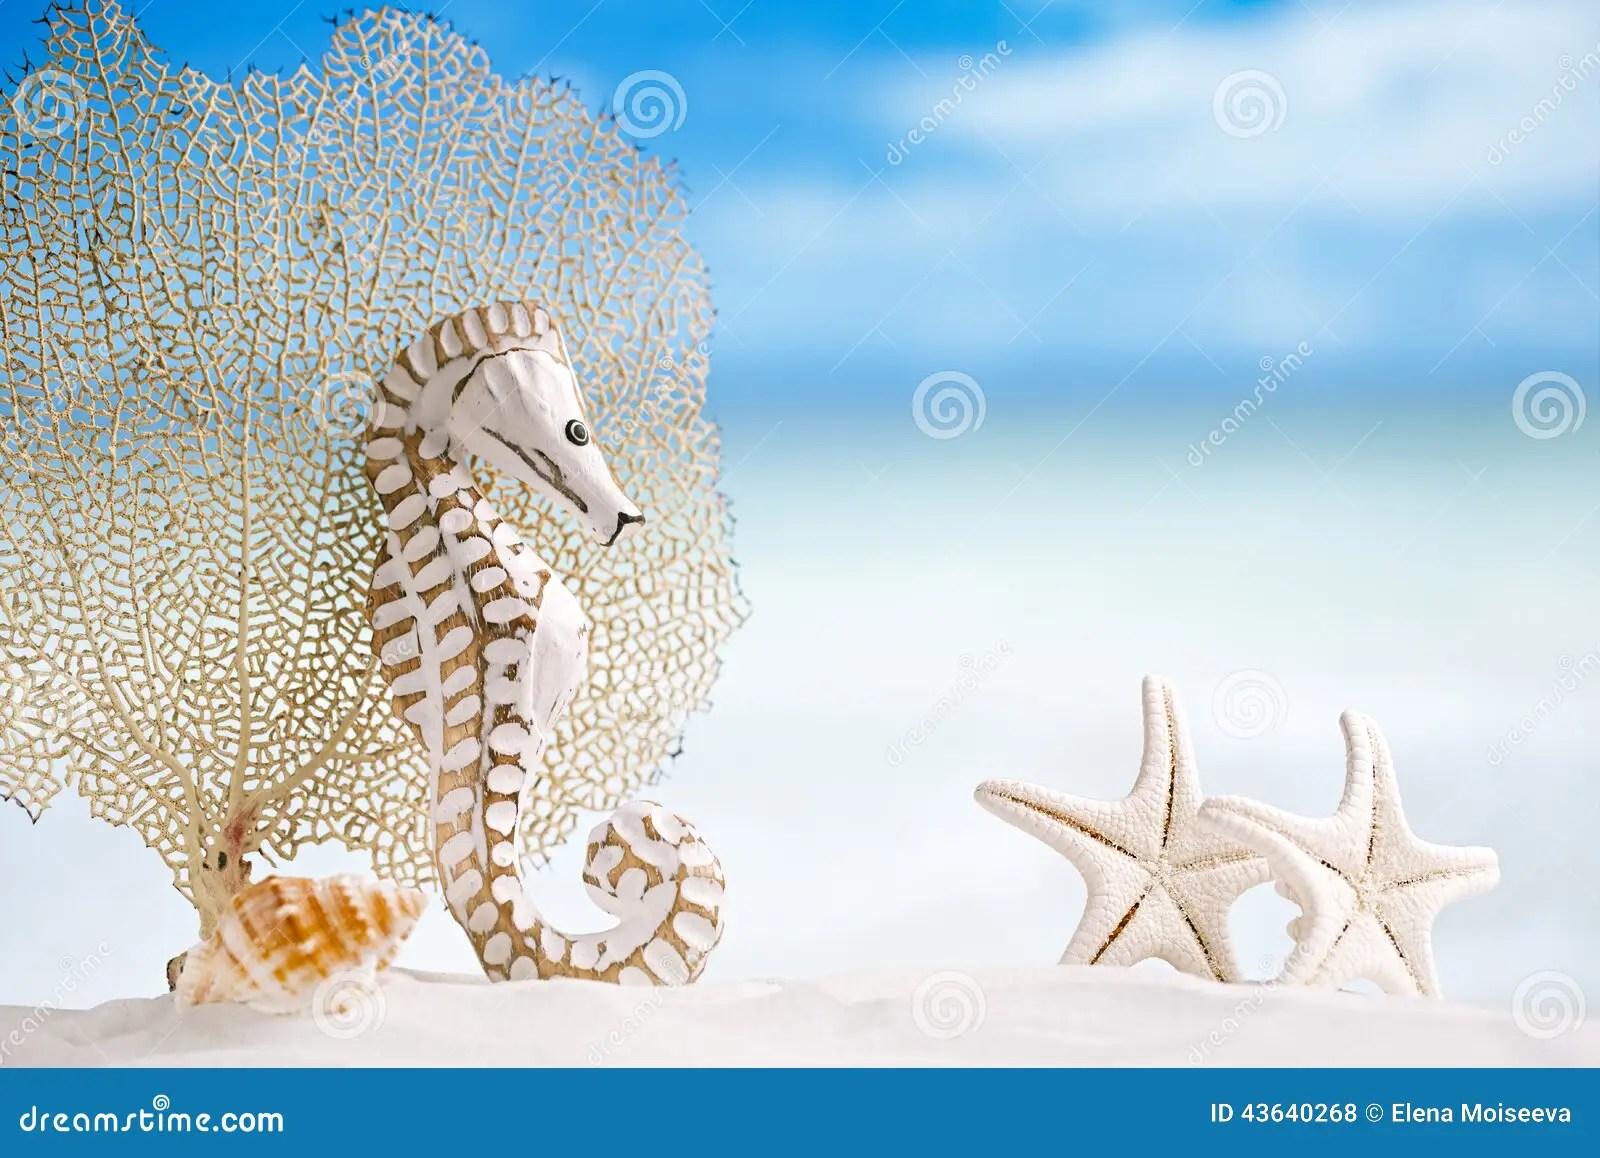 Seahorse With White Starfish On White Sand Beach Ocean